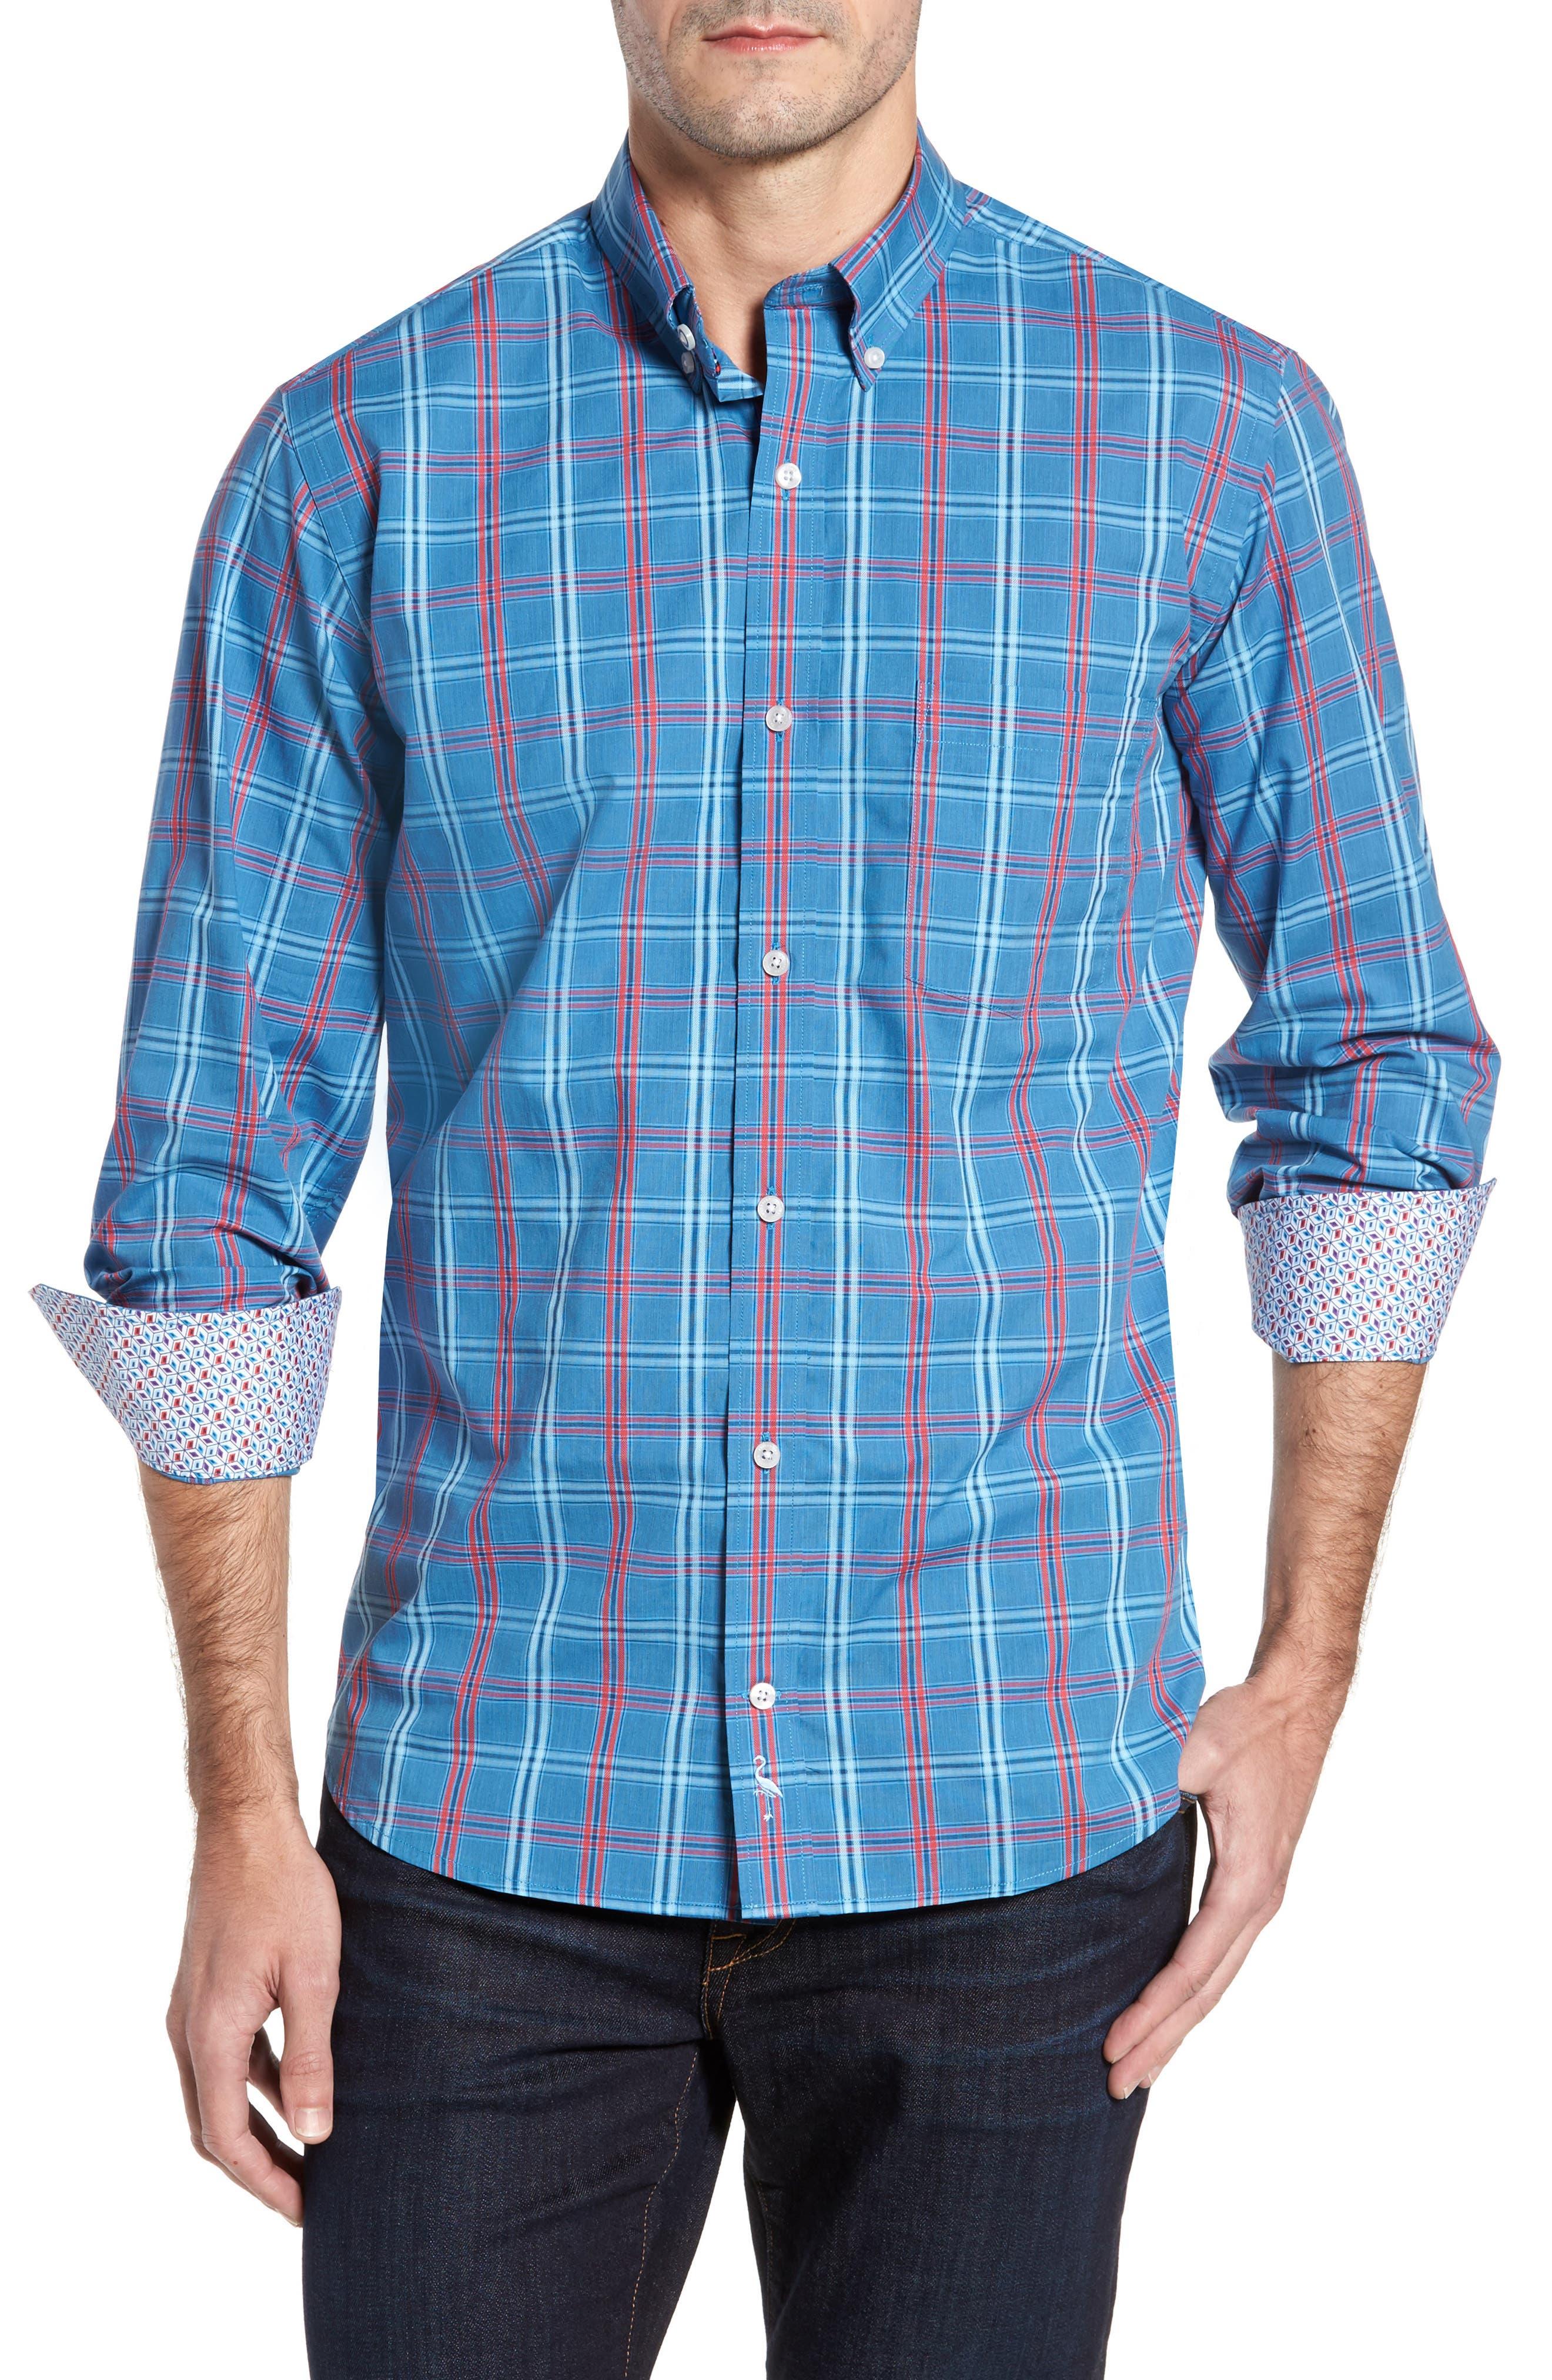 Ashland Windowpane Check Sport Shirt,                             Main thumbnail 1, color,                             Blue